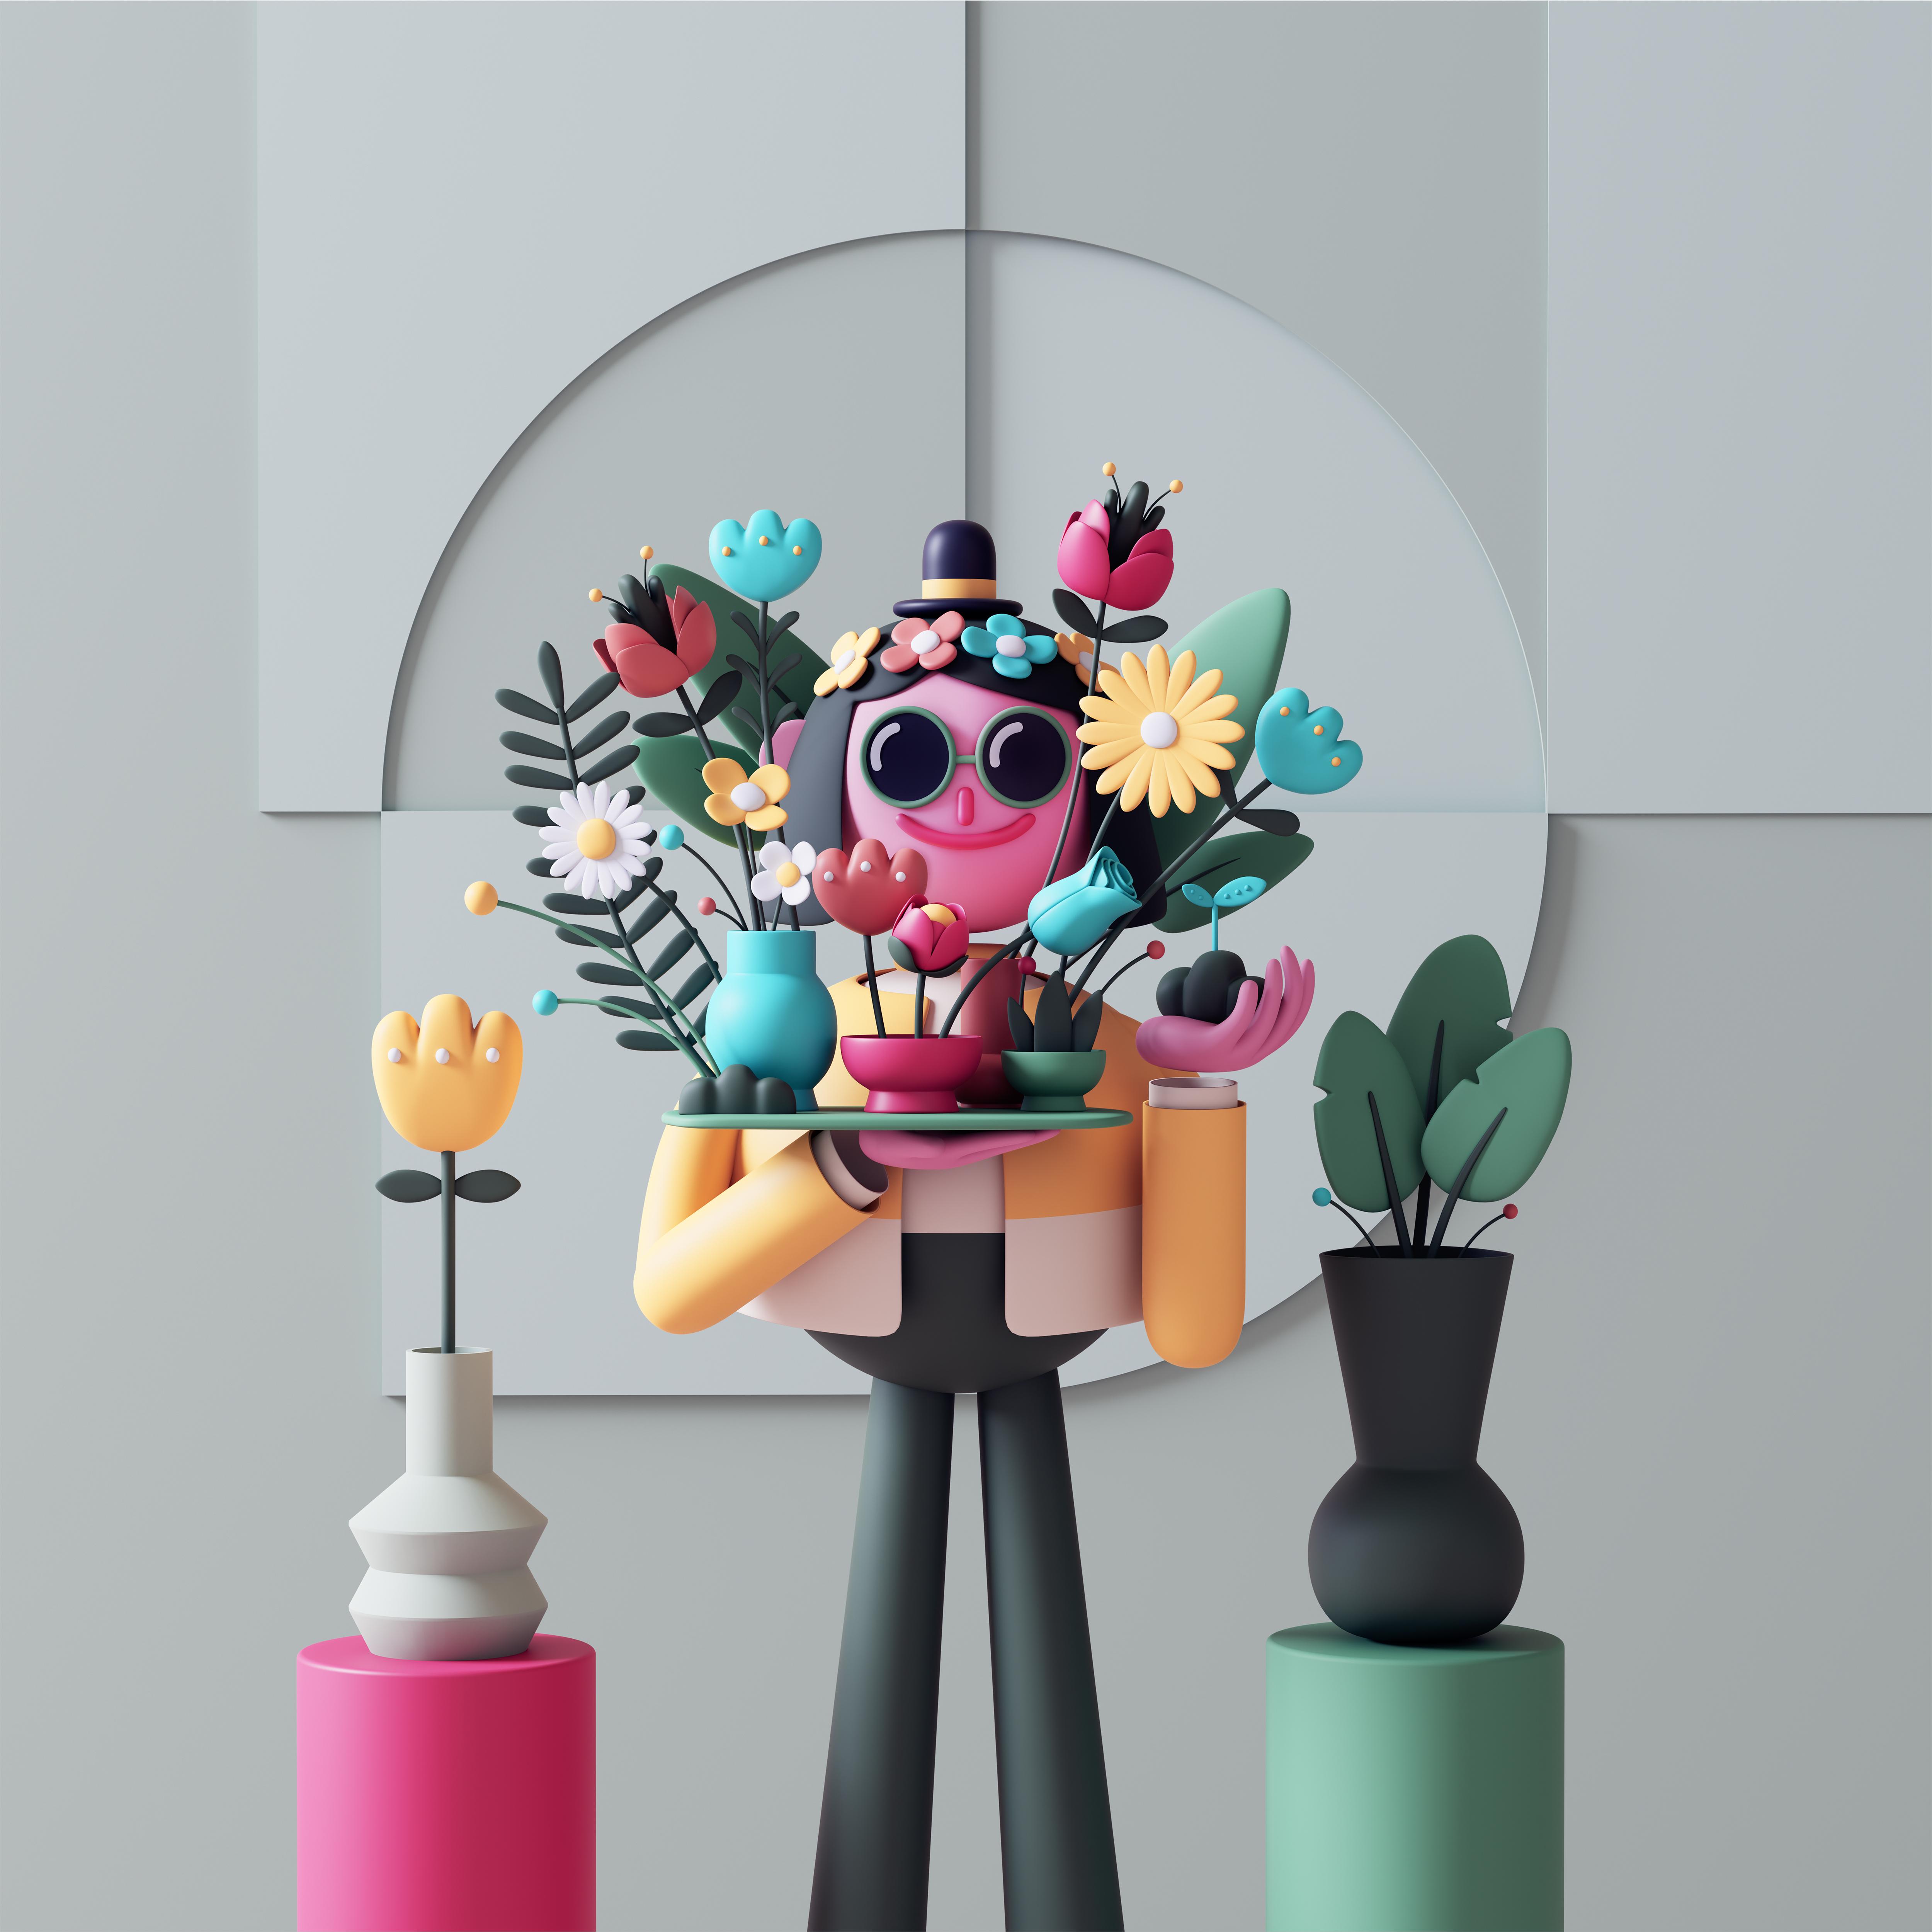 Chromebook imaginary wallpaper